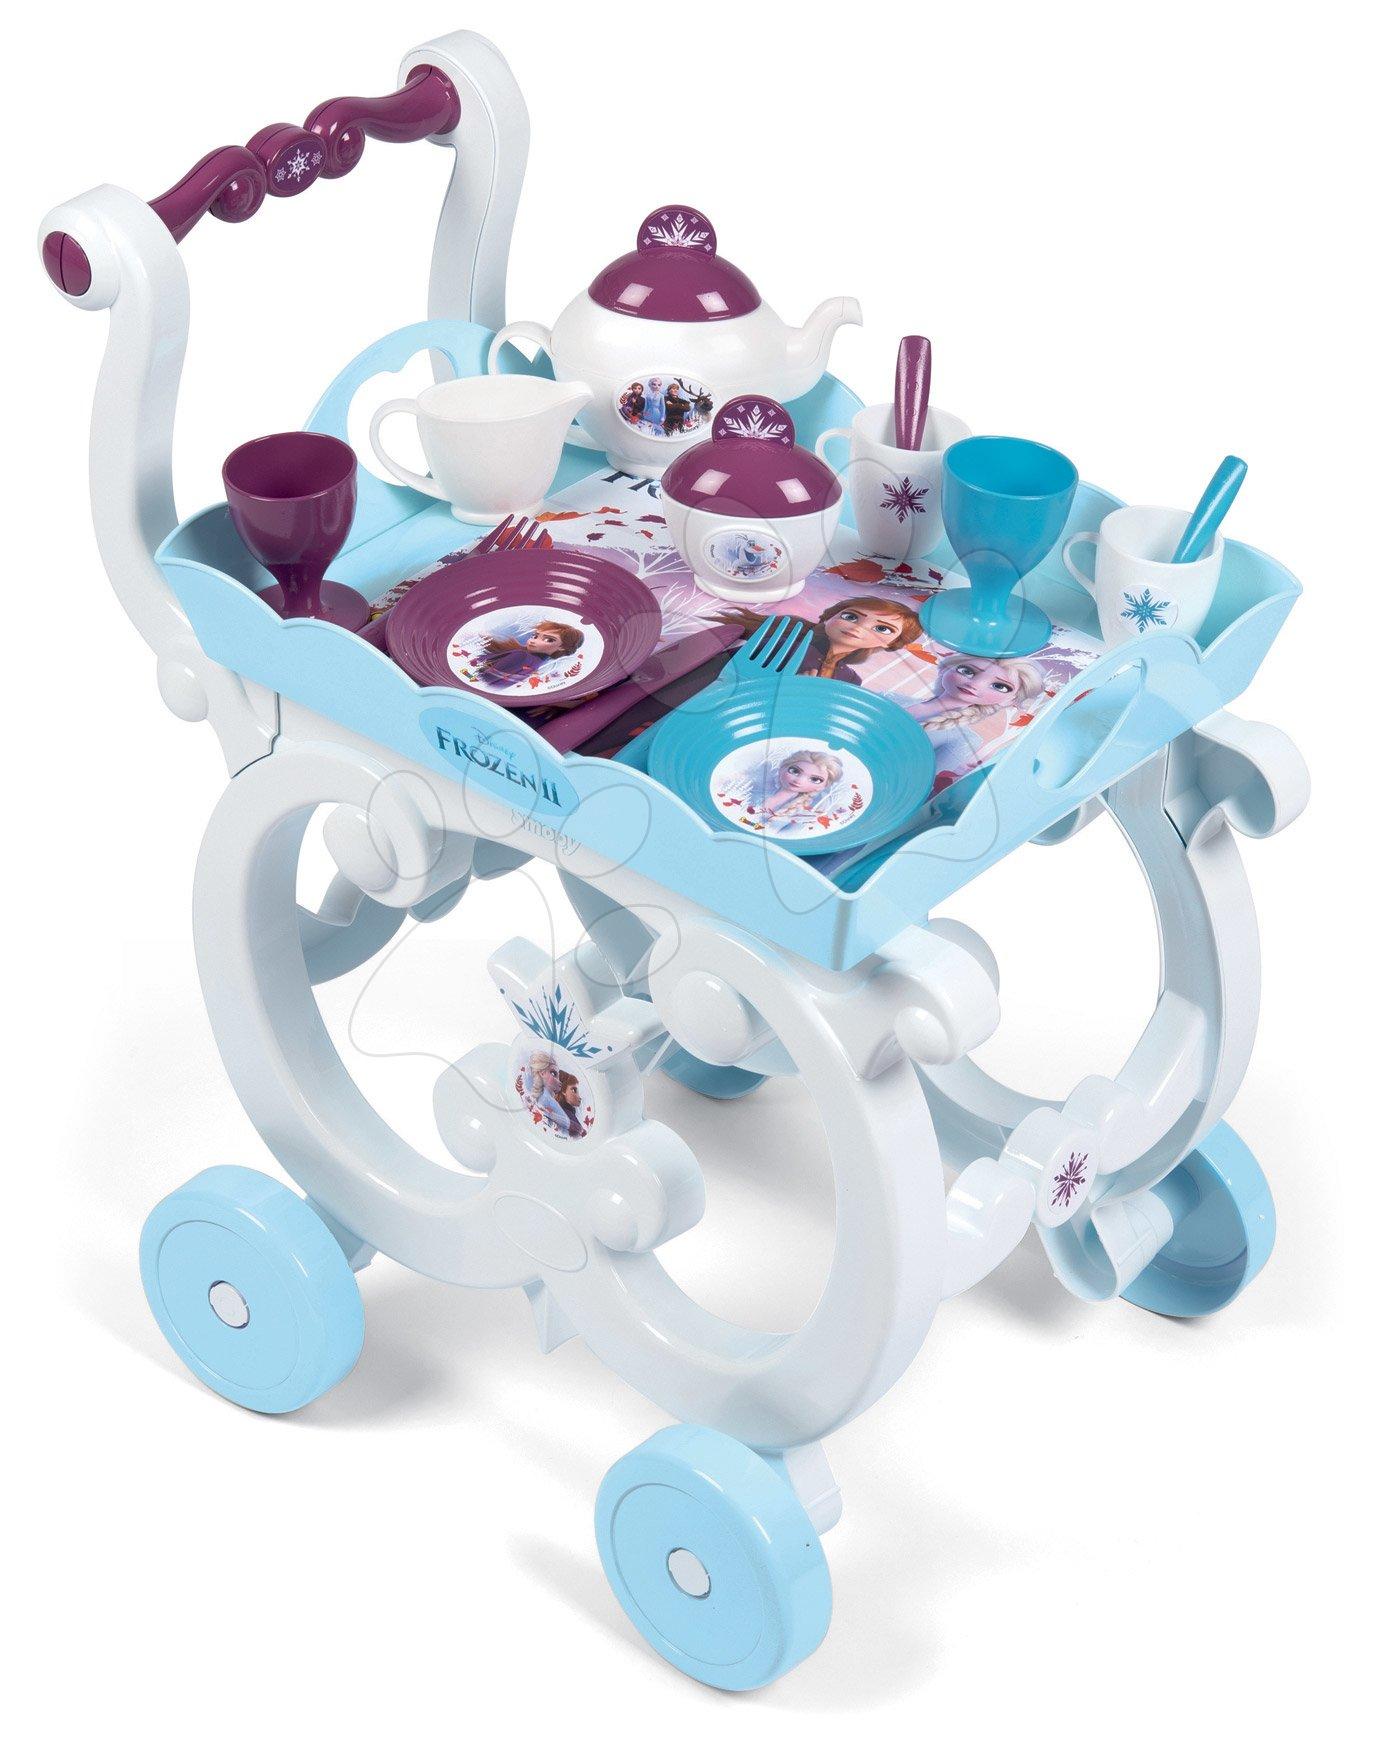 Servírovací vozík Frozen 2 Disney XL Tea Trolley Smoby so 17 doplnkami